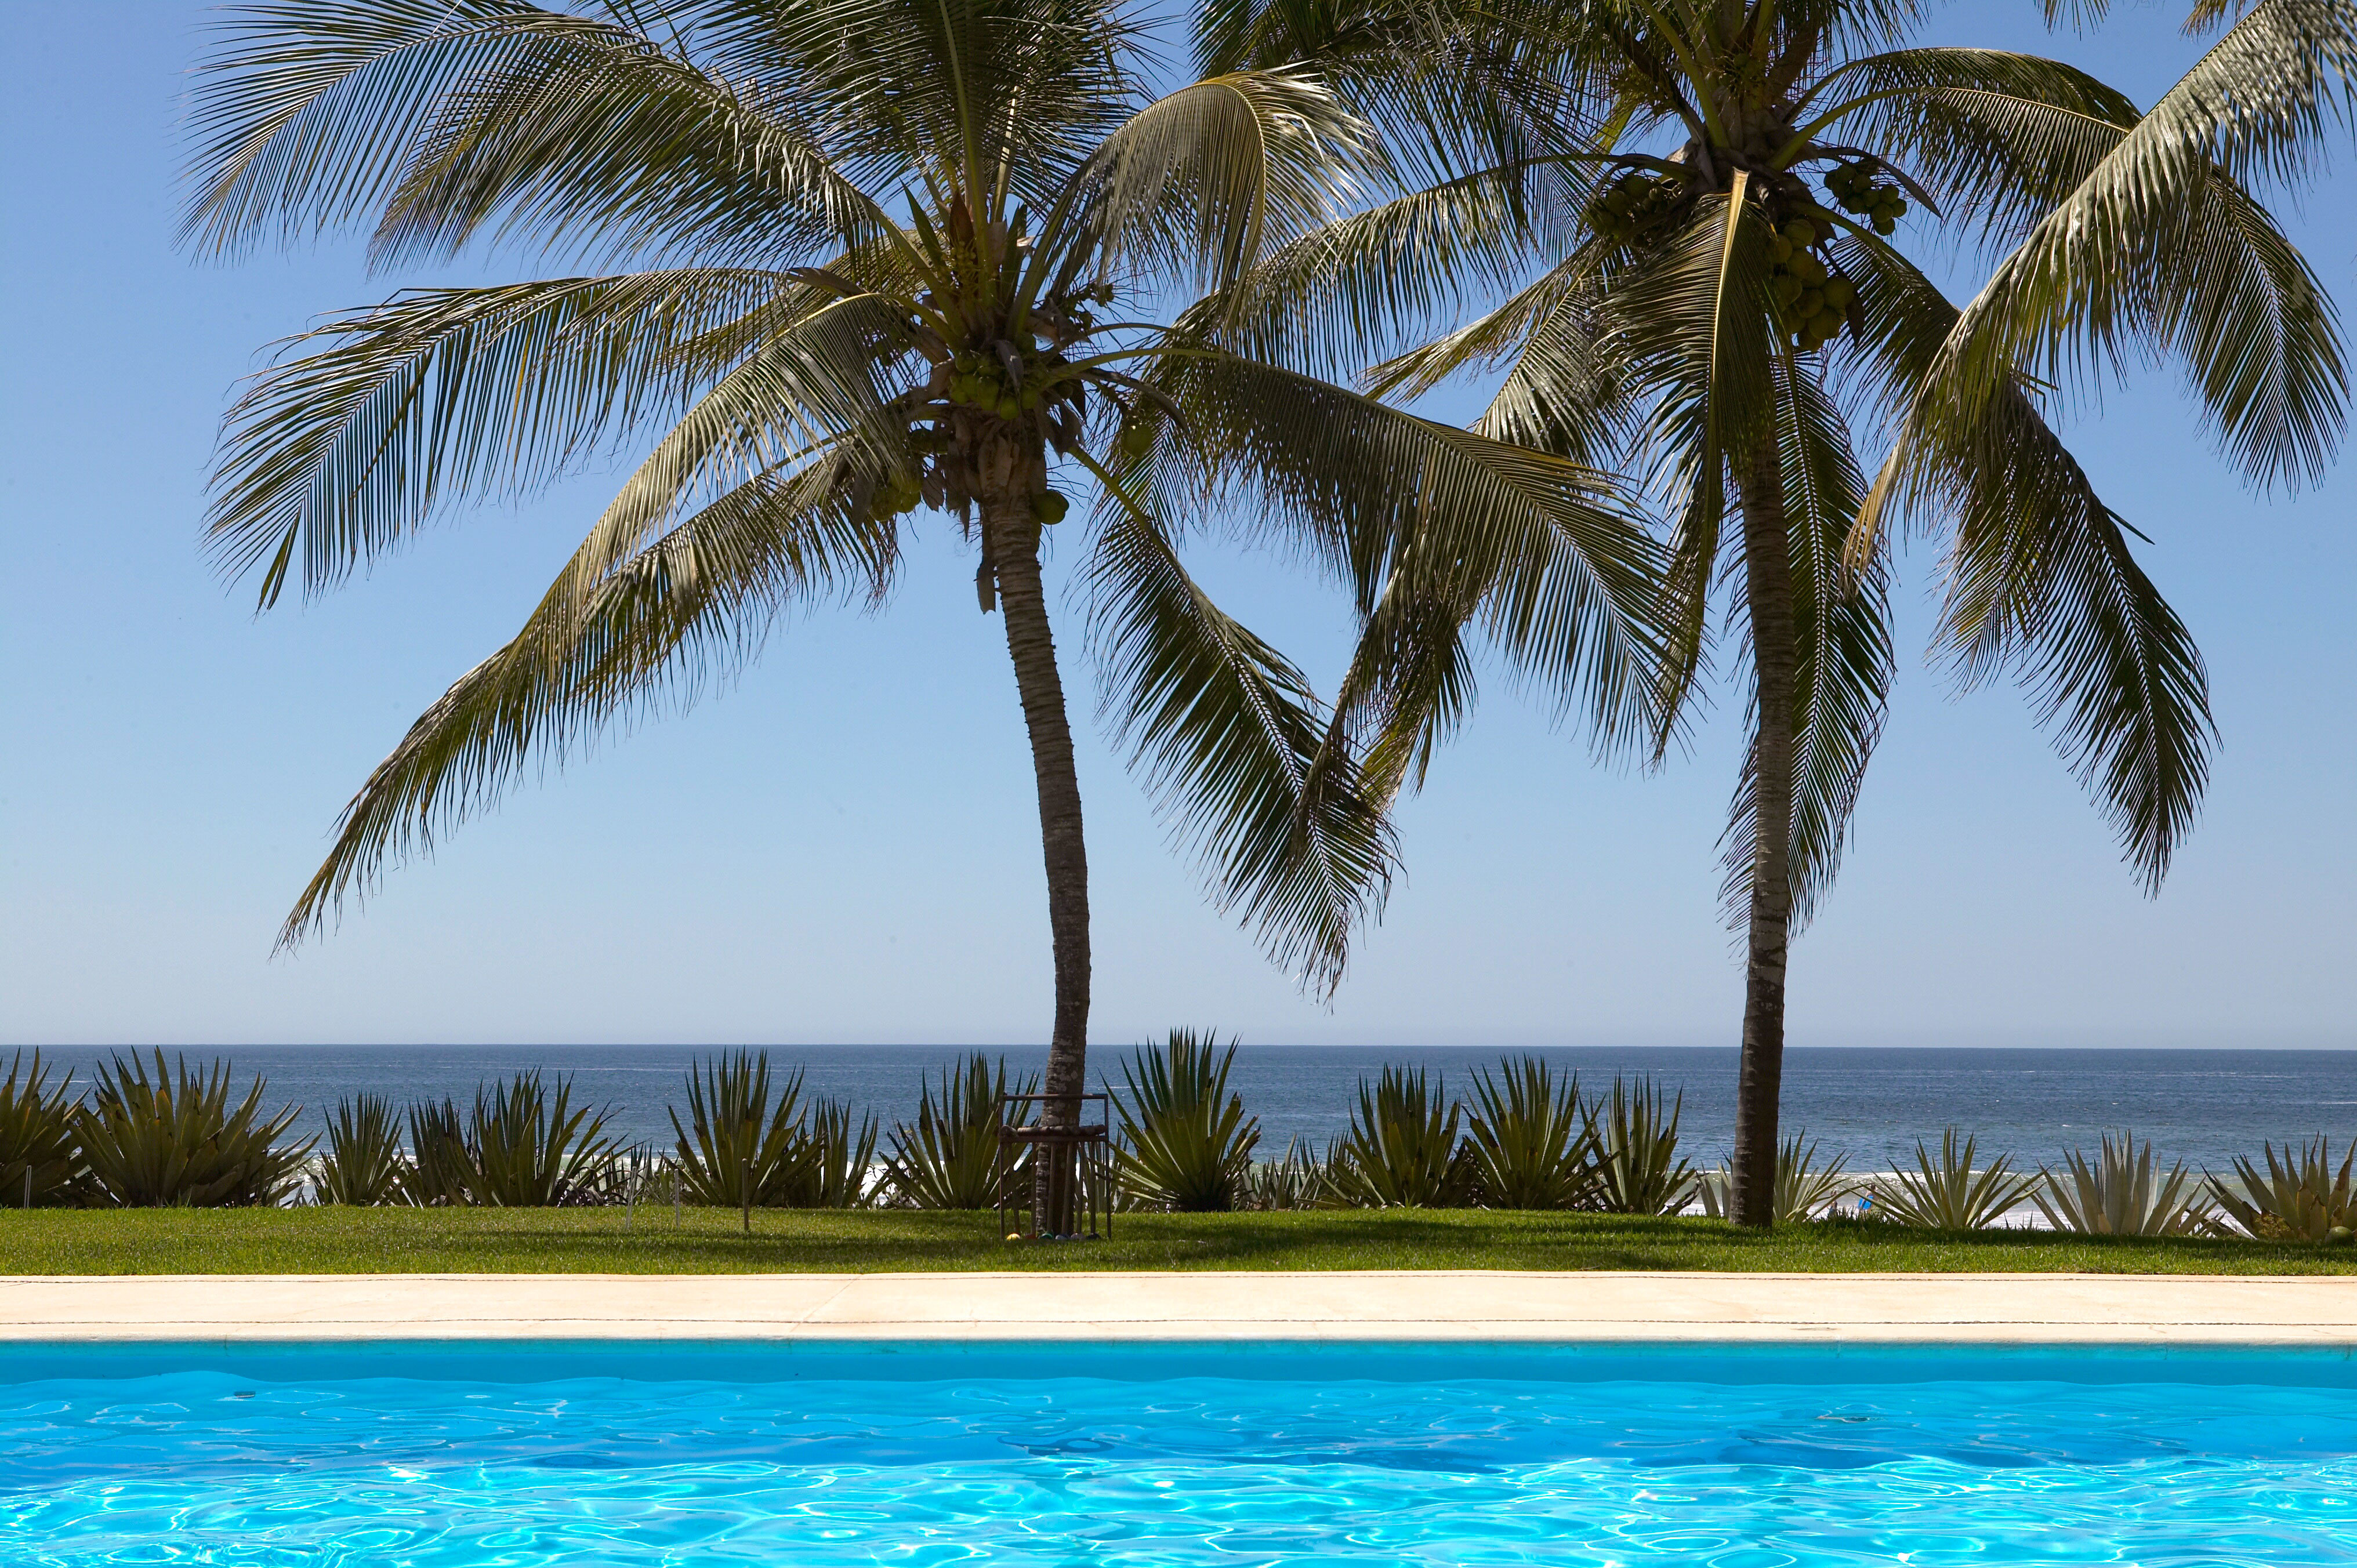 Beachfront Luxury Pool Scenic views tree palm sky Beach water plant swimming pool palm family caribbean arecales Ocean Sea woody plant Resort Lagoon tropics lined sandy swimming shade